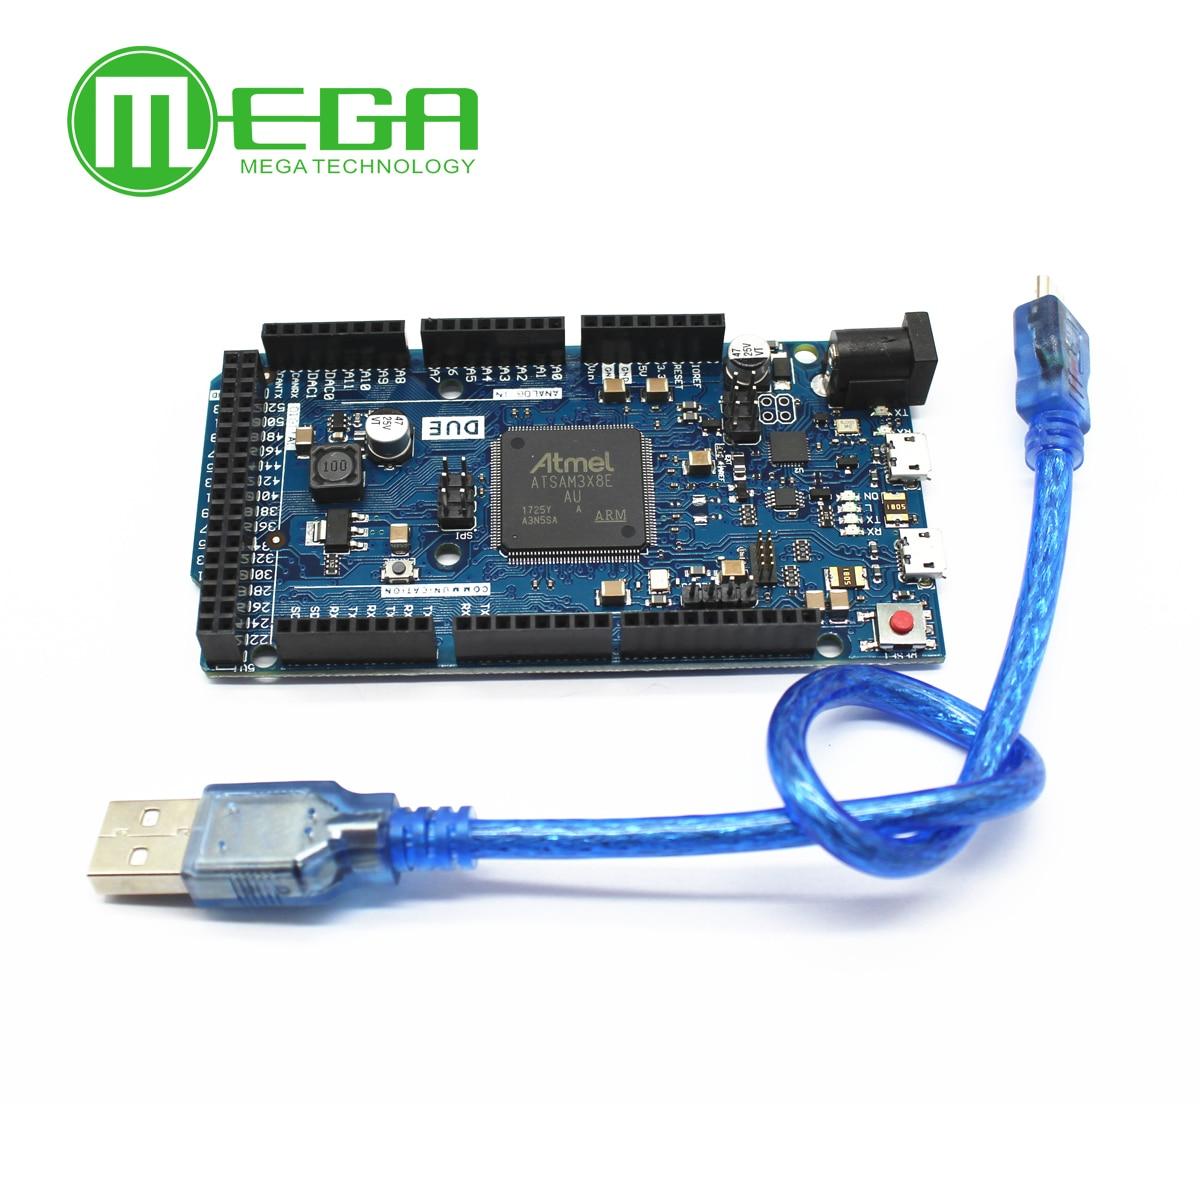 work-good-due-r3-board-at91sam3x8e-sam3x8e-32-bit-arm-cortex-m3-control-board-module-for-font-b-arduino-b-font